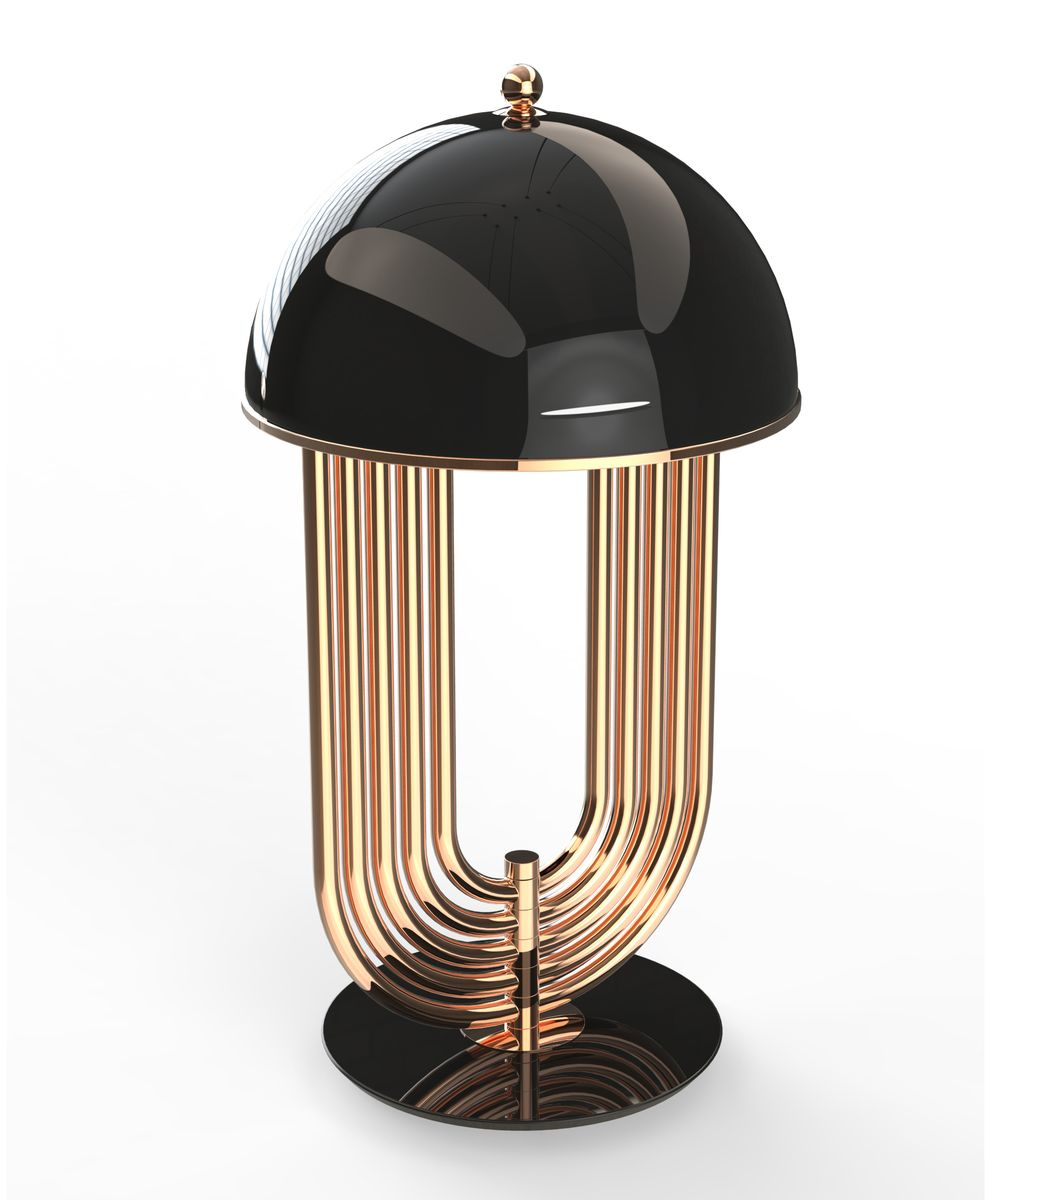 obiecte de design celebre Turner Delightfull